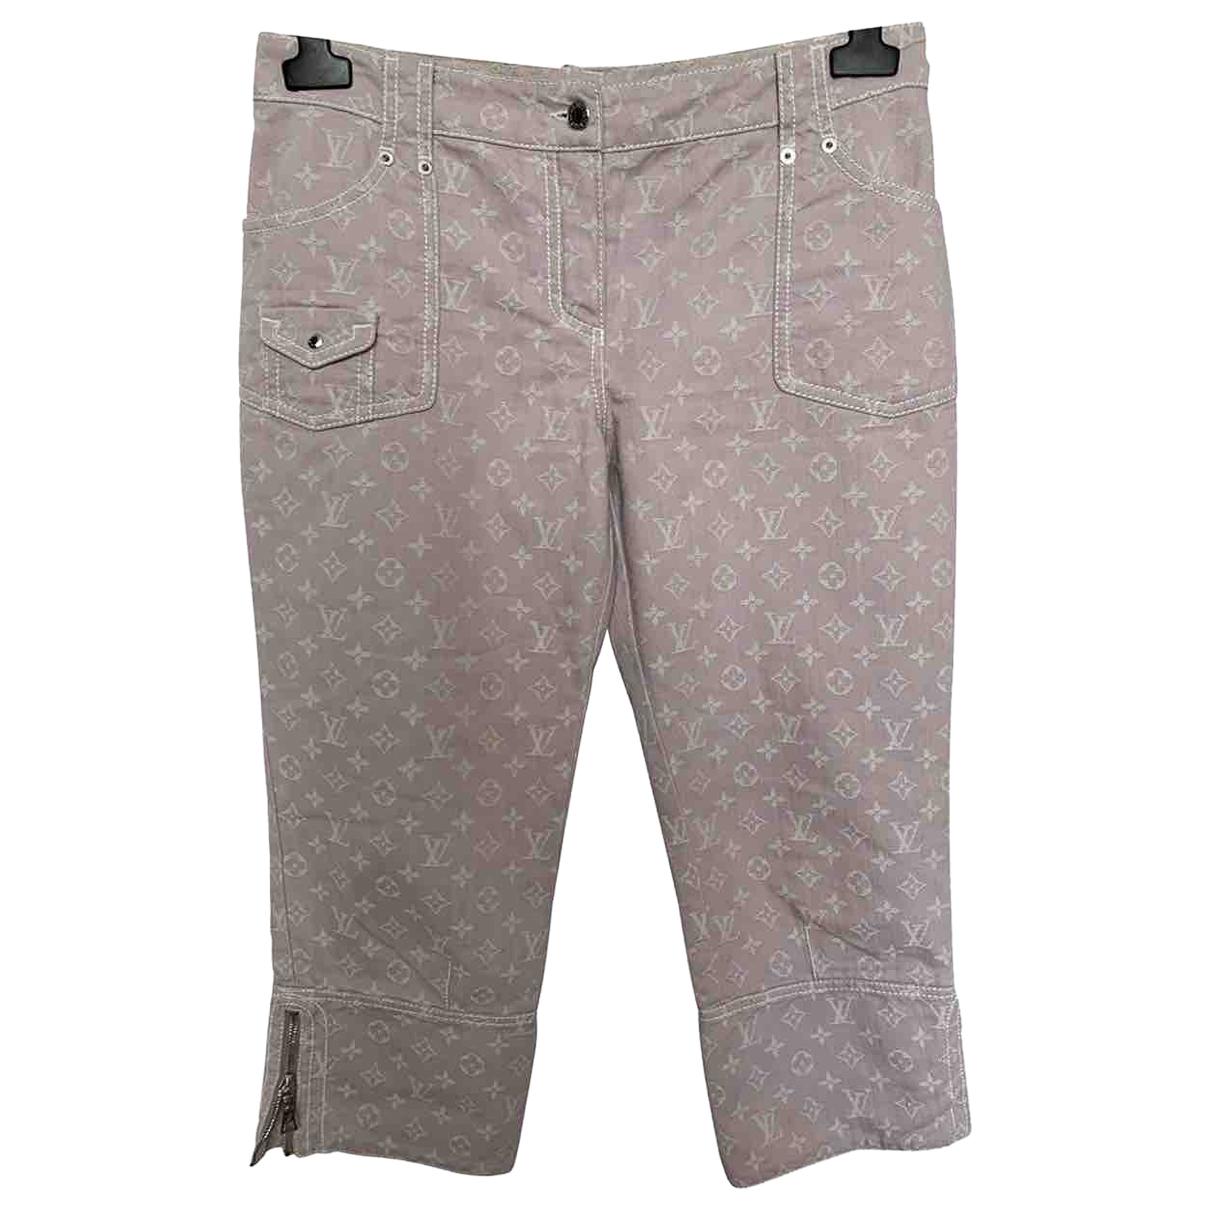 Louis Vuitton \N Pink Denim - Jeans Jeans for Women 42 FR